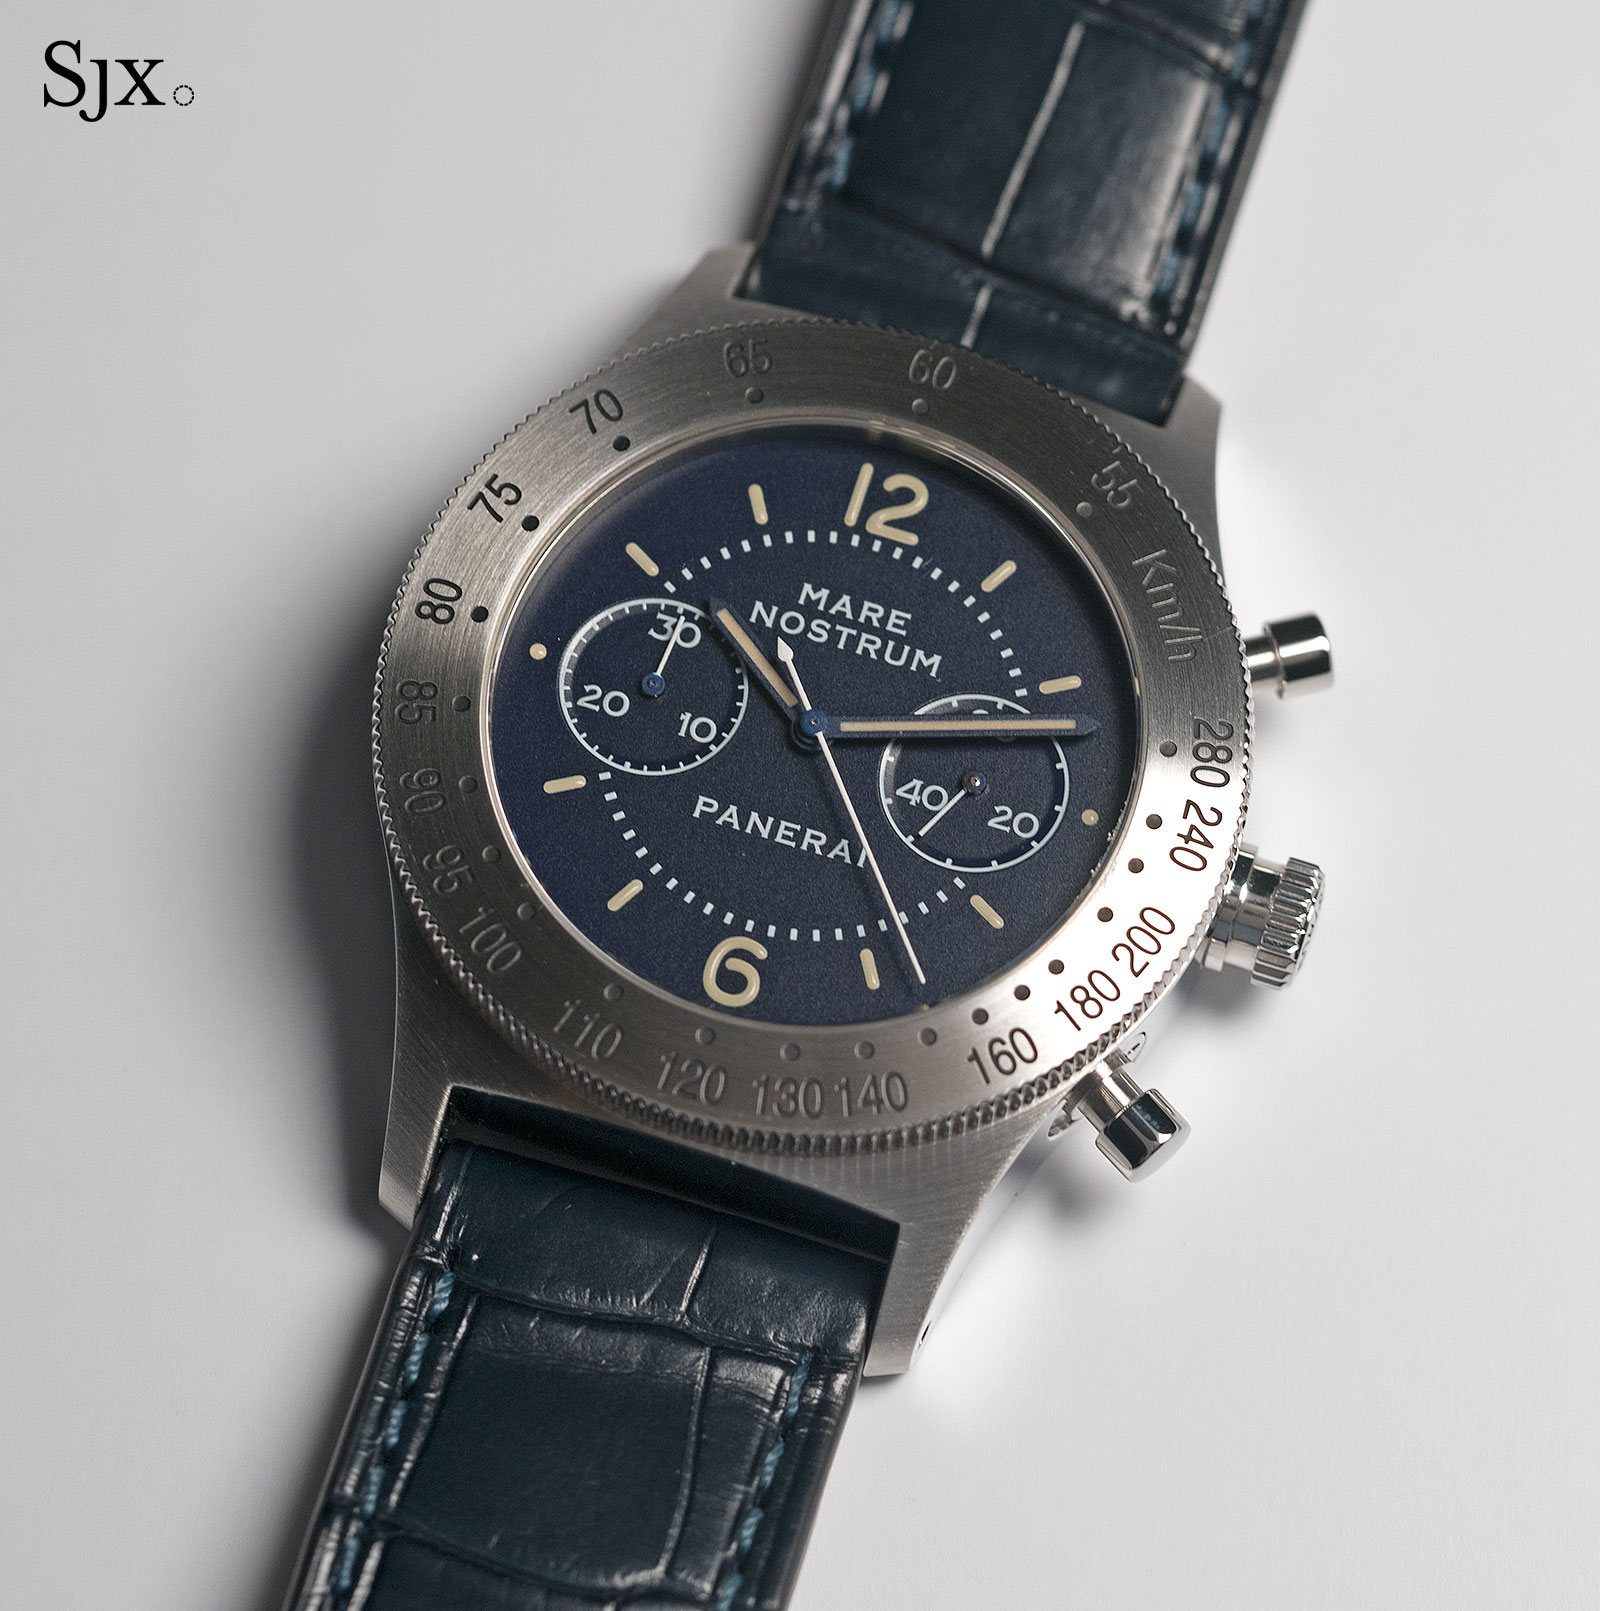 Panerai Mare Nostrum PAM 716 chrono 15